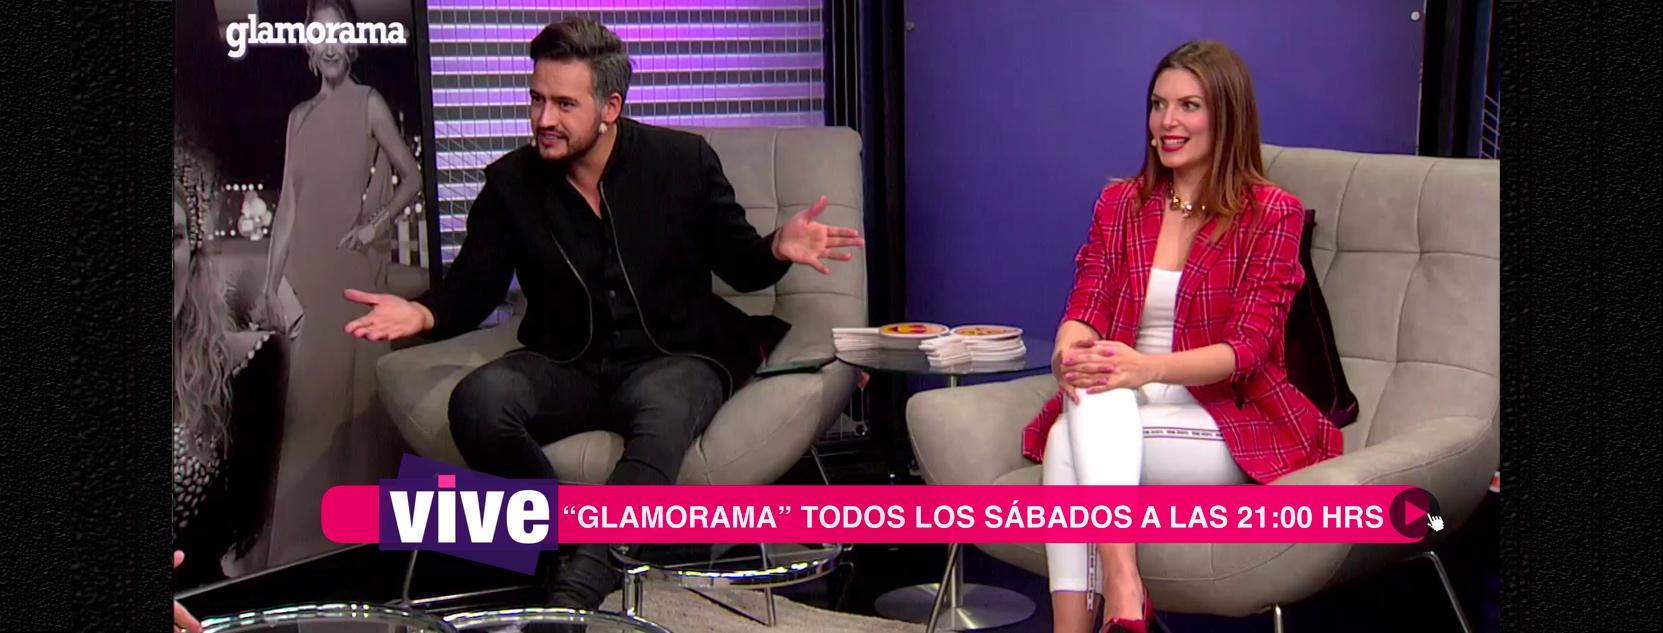 glamorama-tv